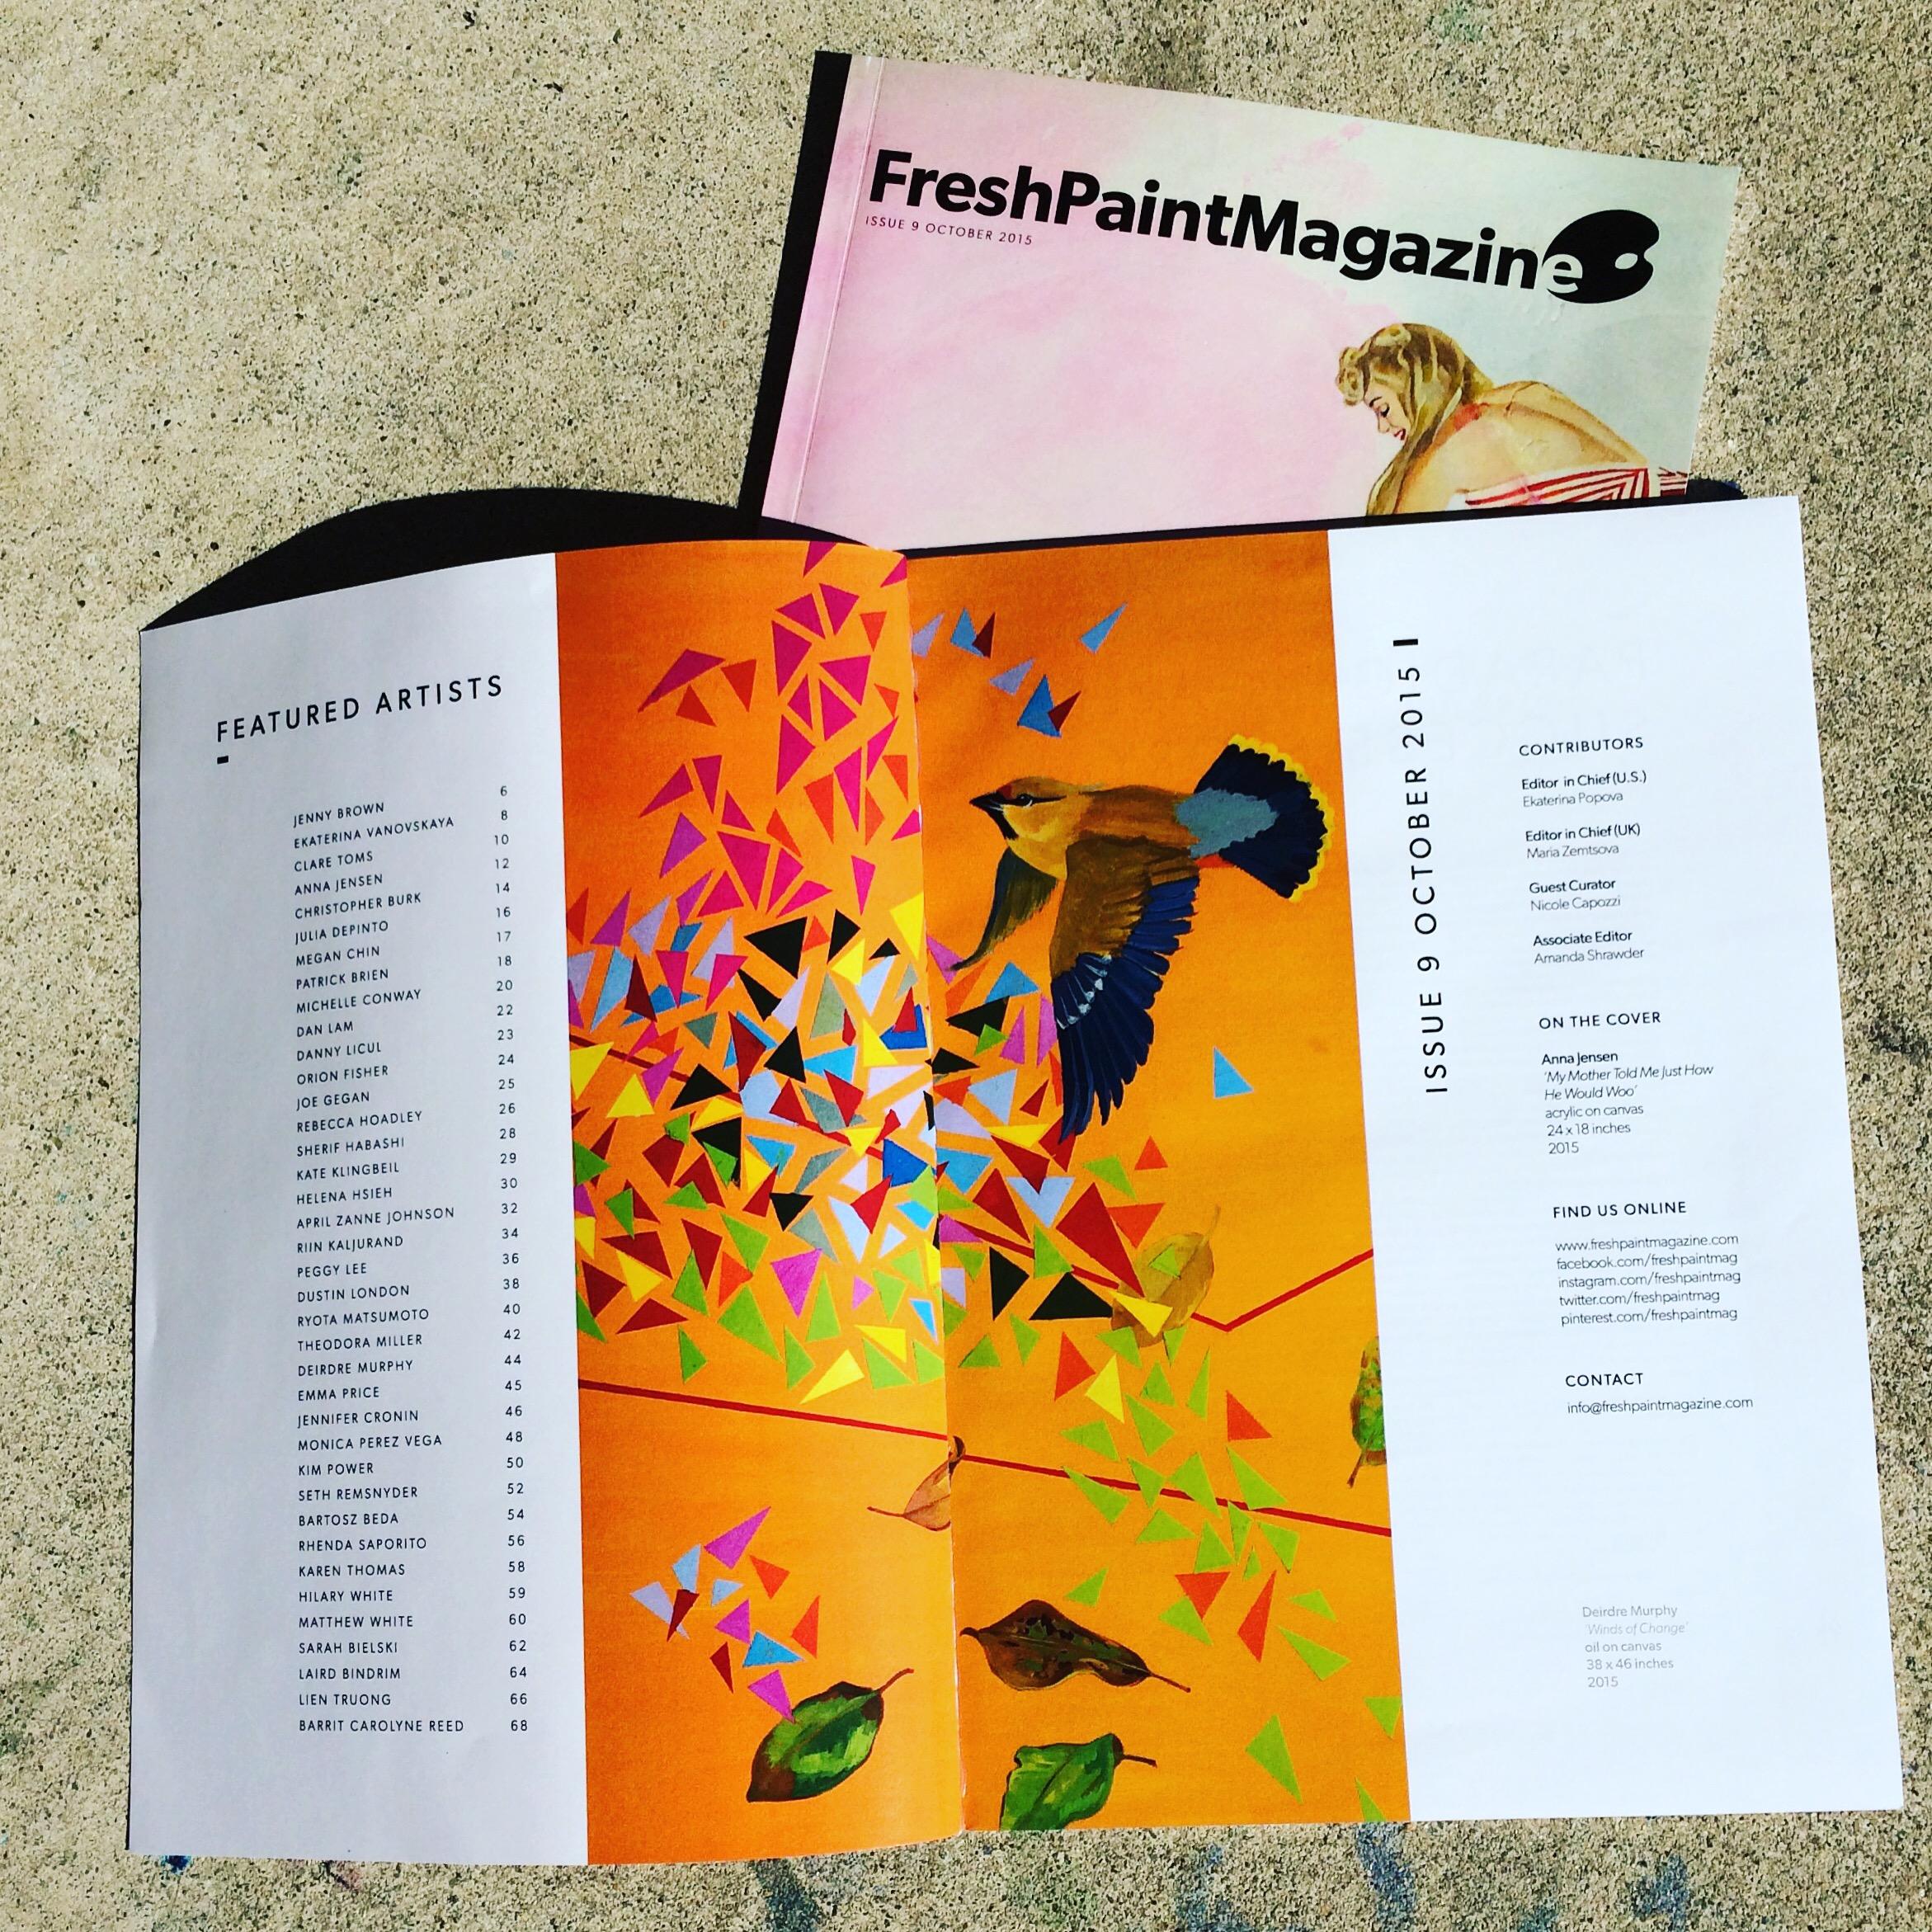 Fresh Paint Magazine, Vol 9, 2015